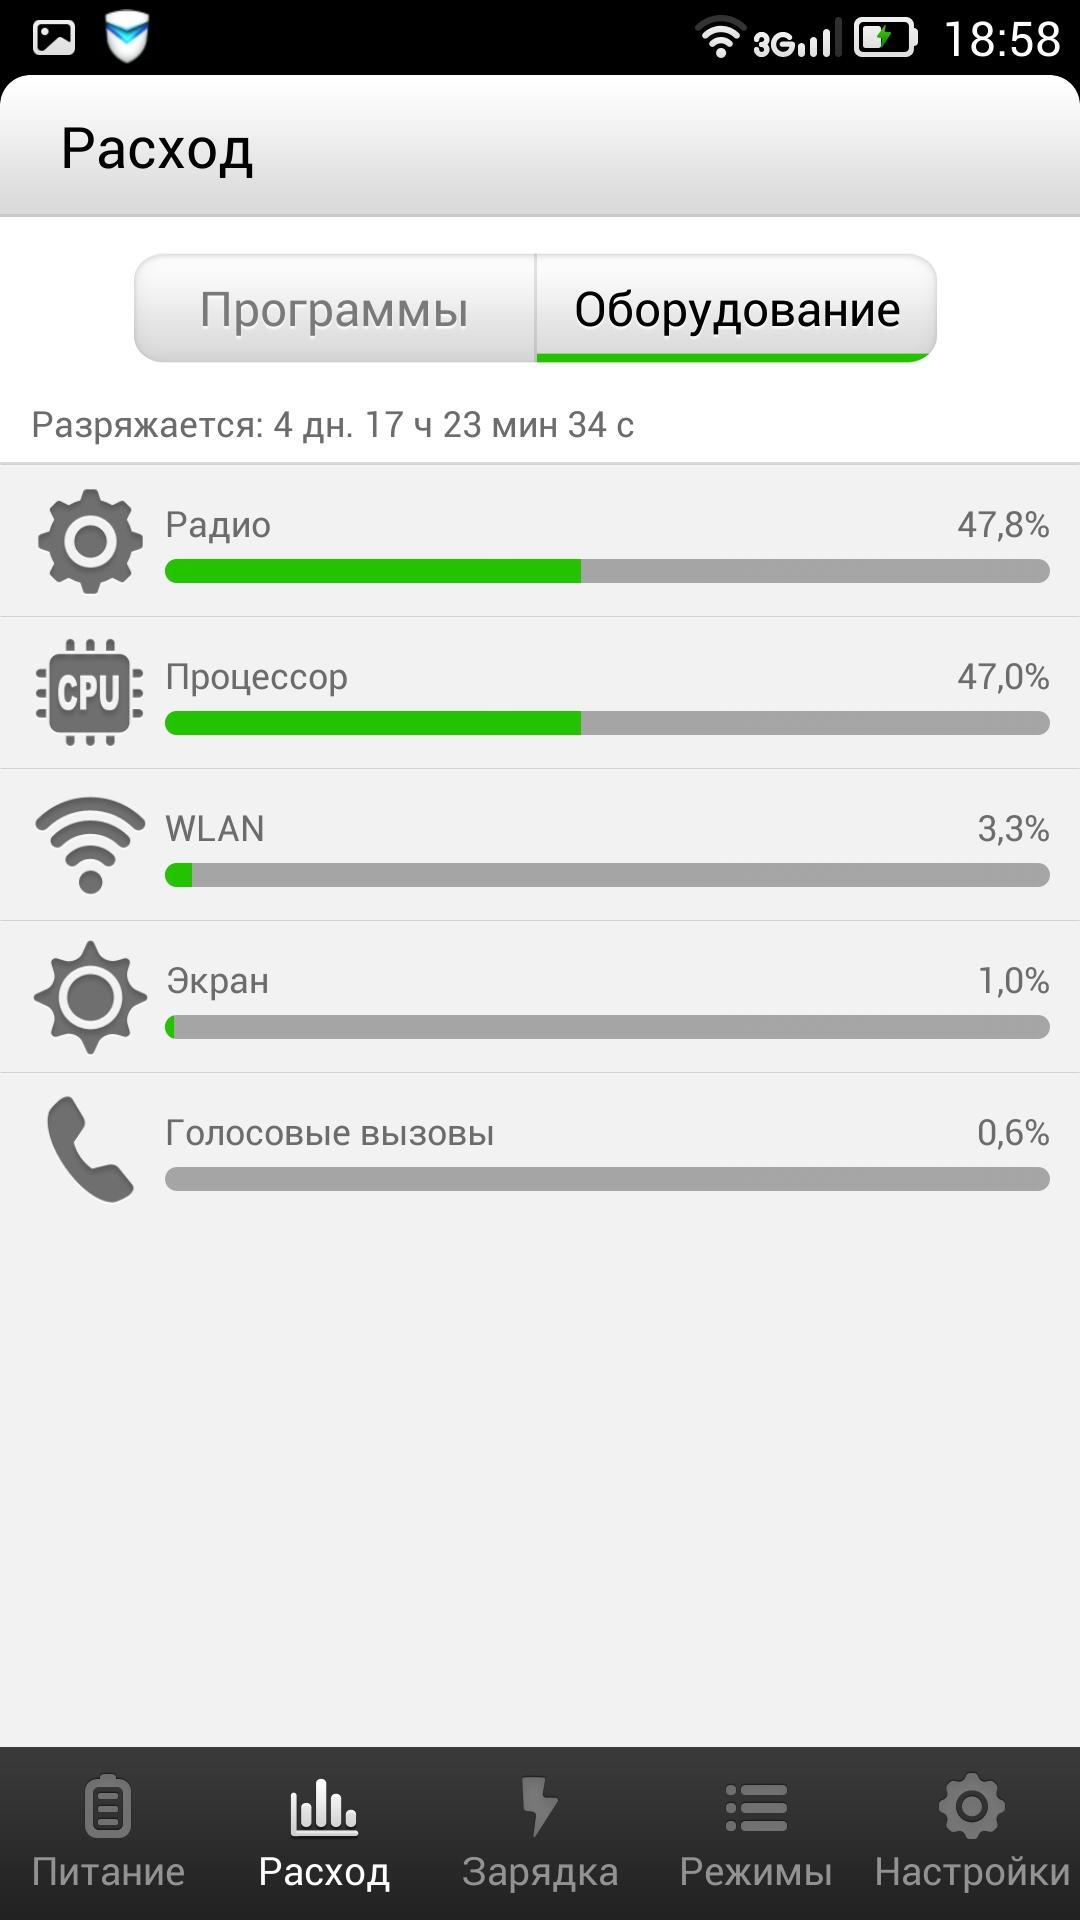 Screenshot_2014-04-29-18-58-34